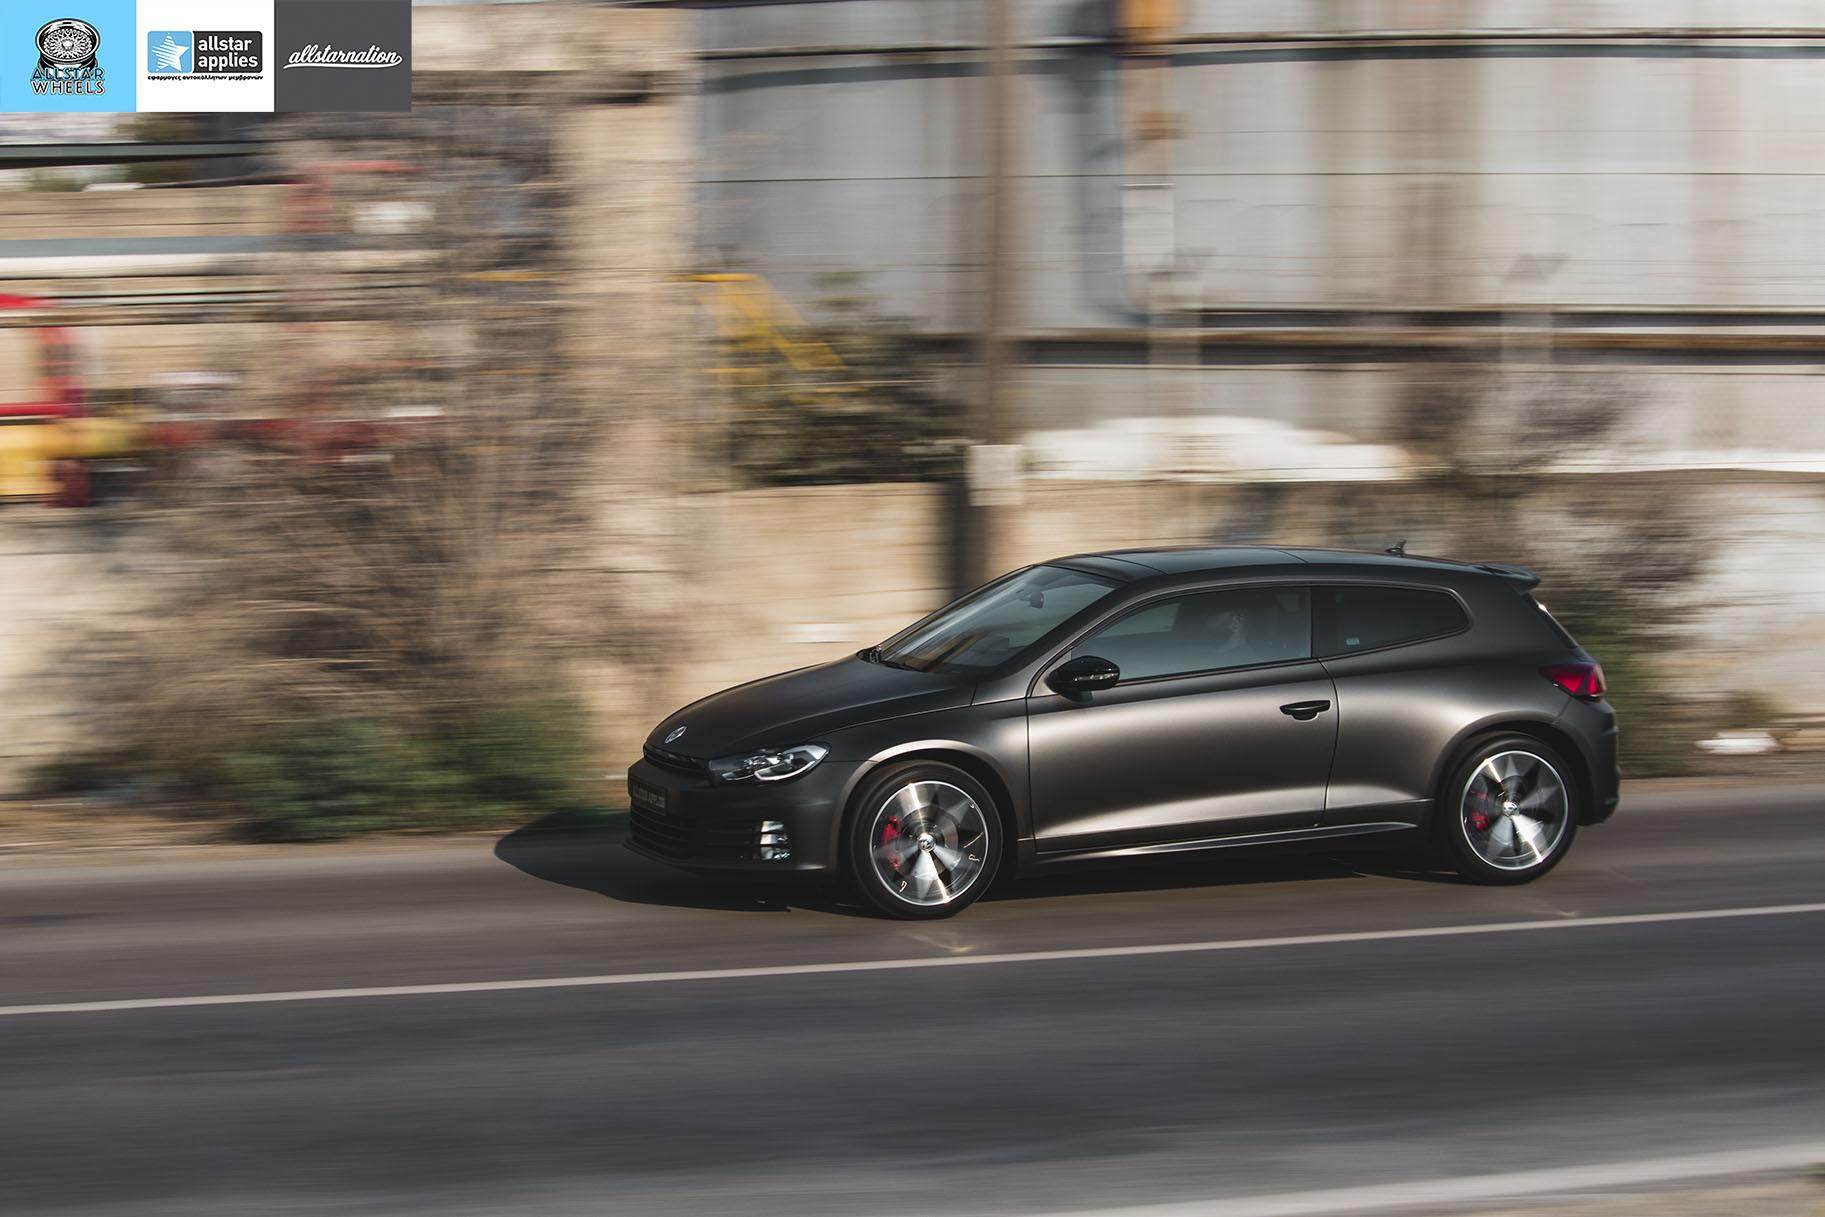 VW SCIROCCO MATT DIAMOND BLACK ALLSTAR APPLIES (18)